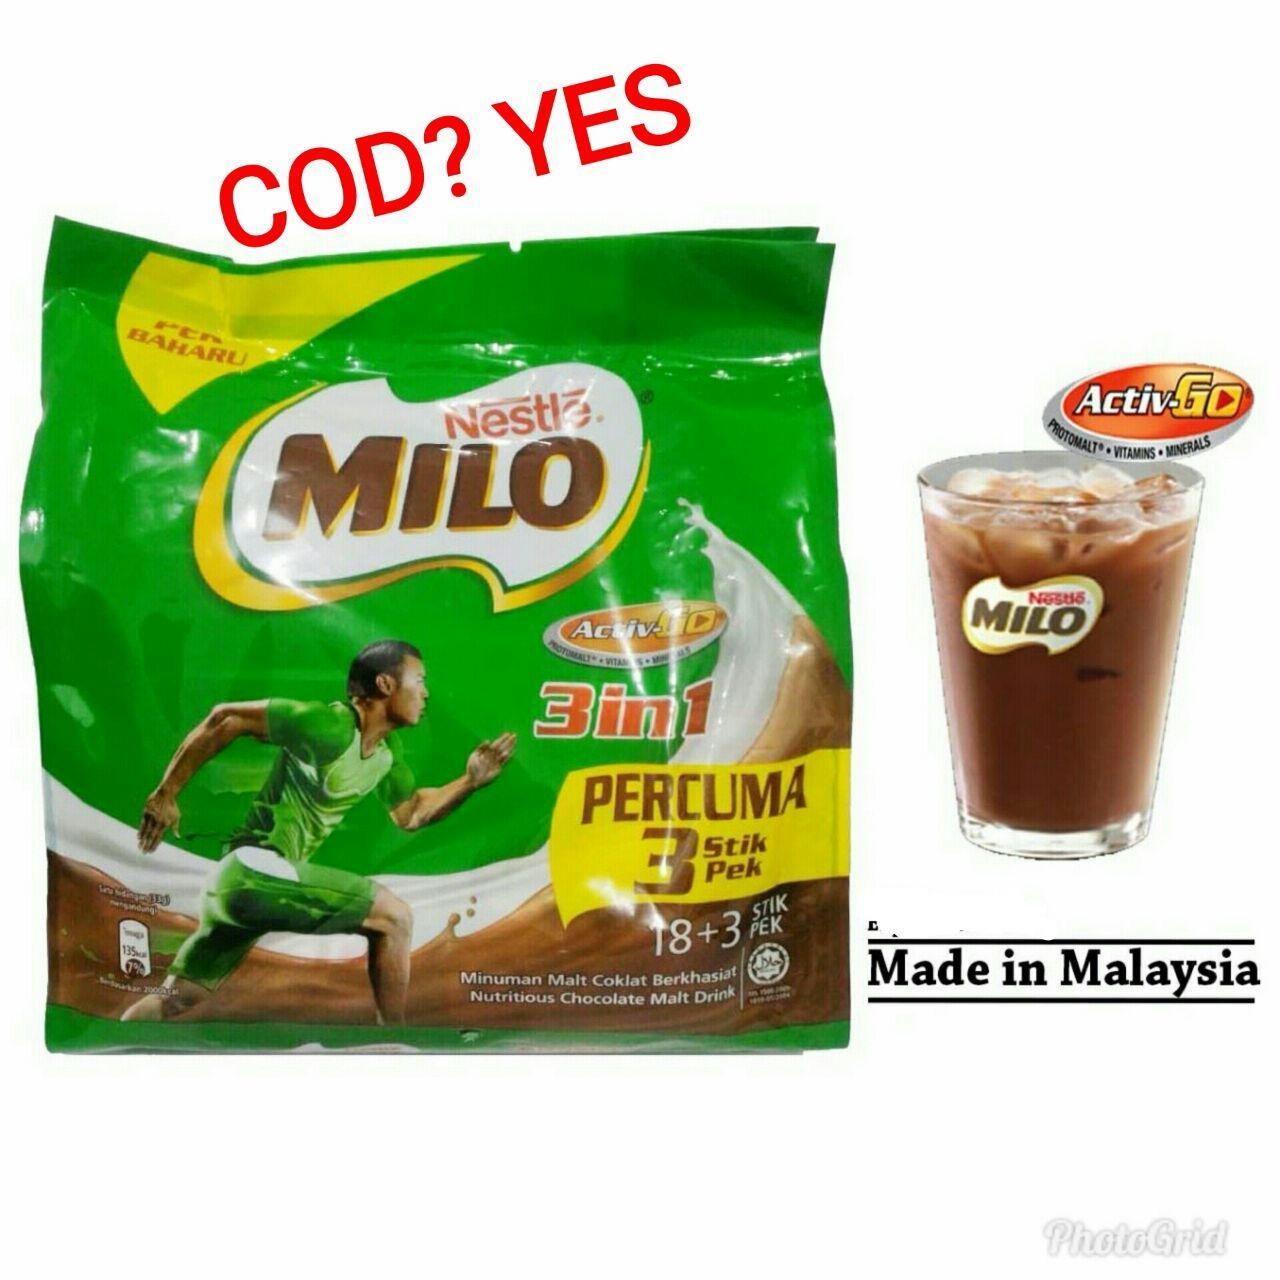 Ch.store milo malaysia 3 in 1 ( 21 sachet ) - BISA COD